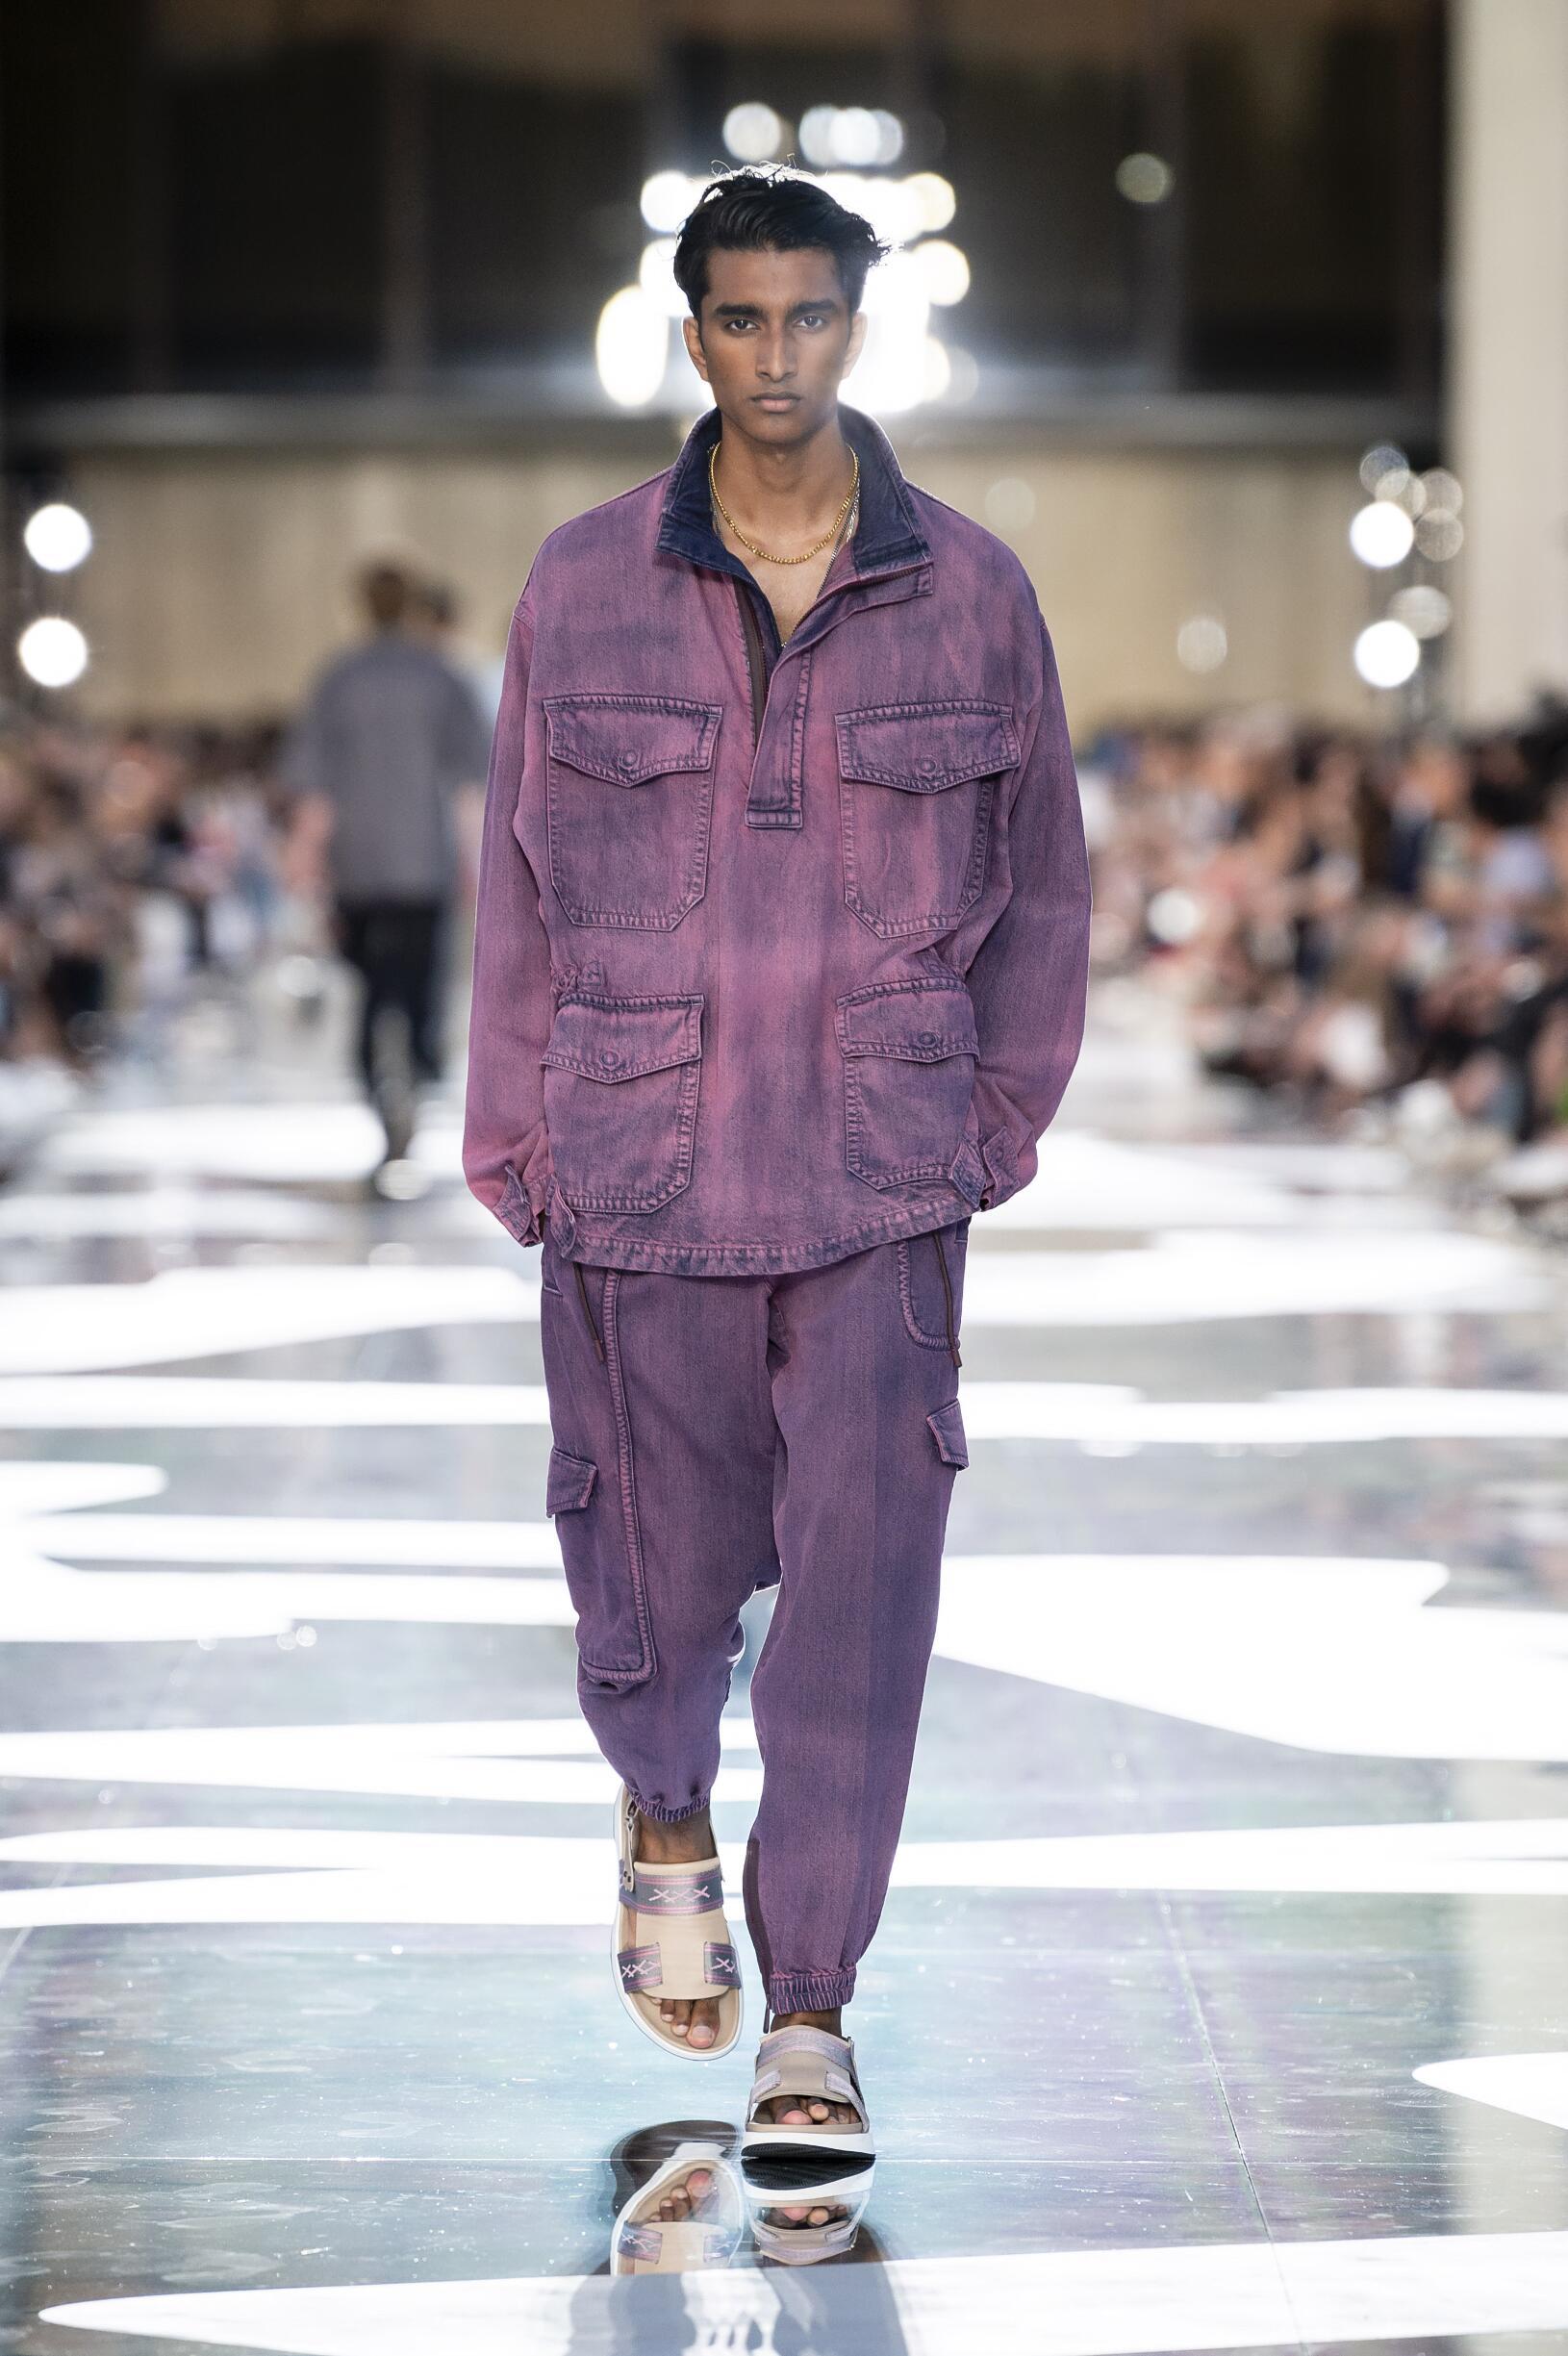 2019 Catwalk Ermenegildo Zegna Couture Man Fashion Show Summer